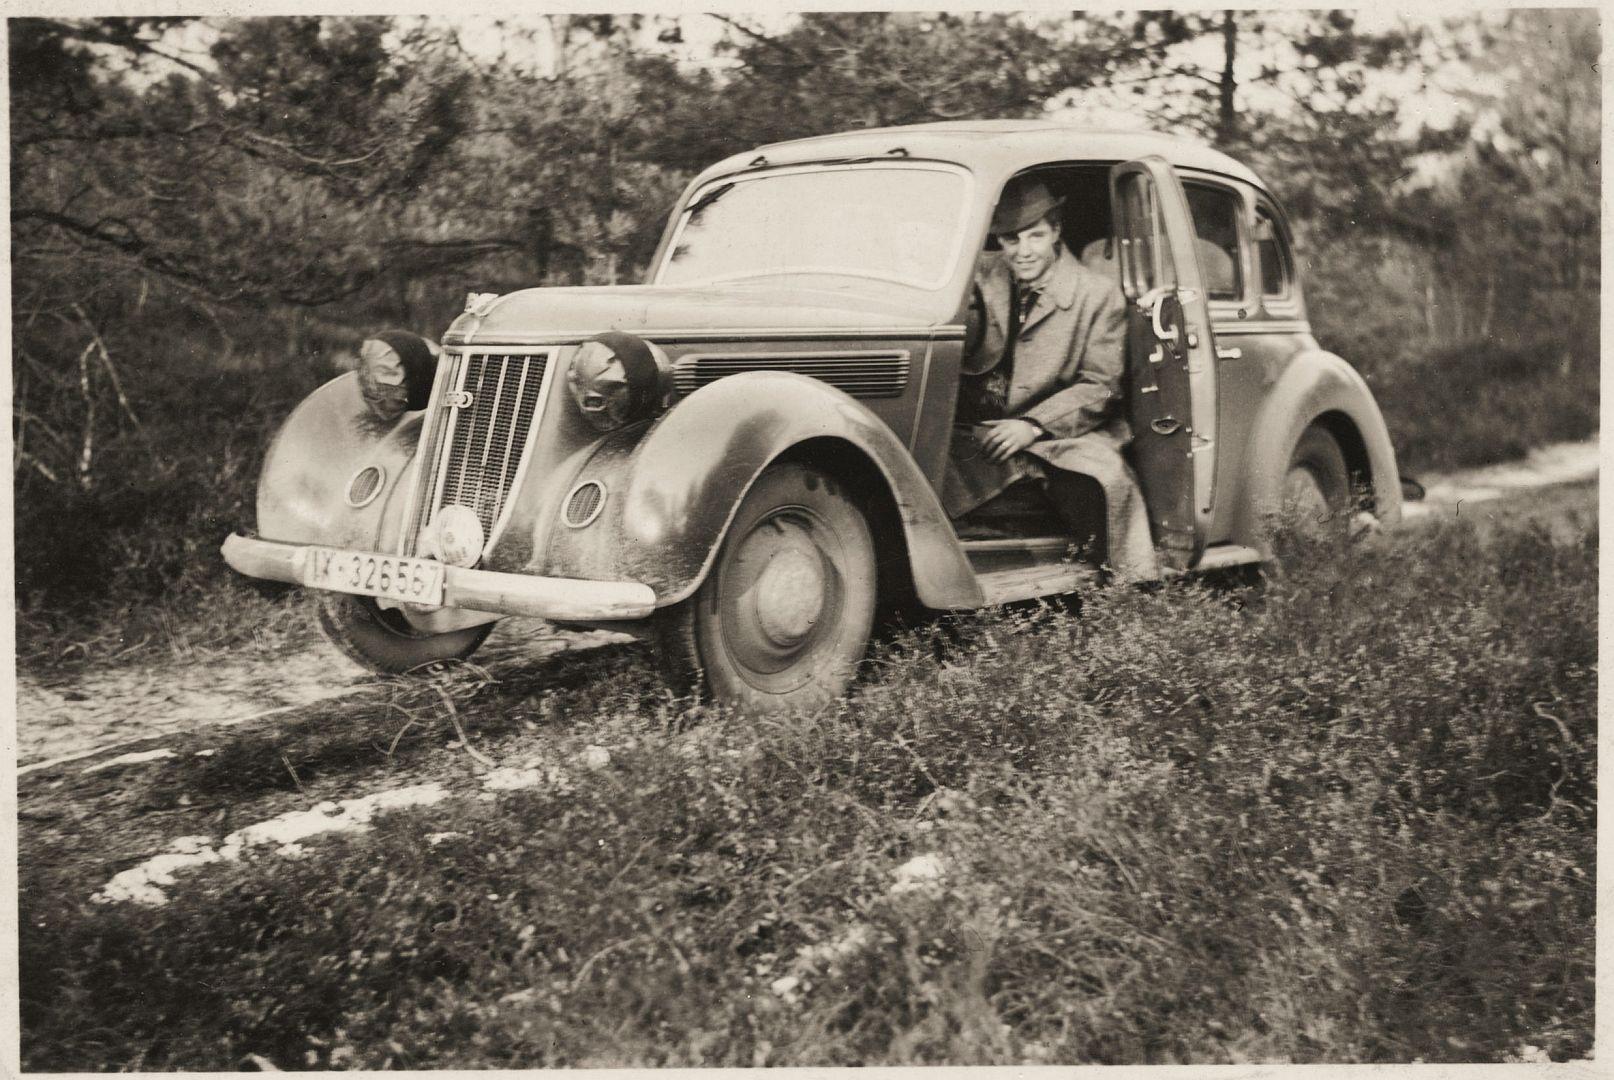 wanderer_w23_oder_24_limousine_1939_galerie